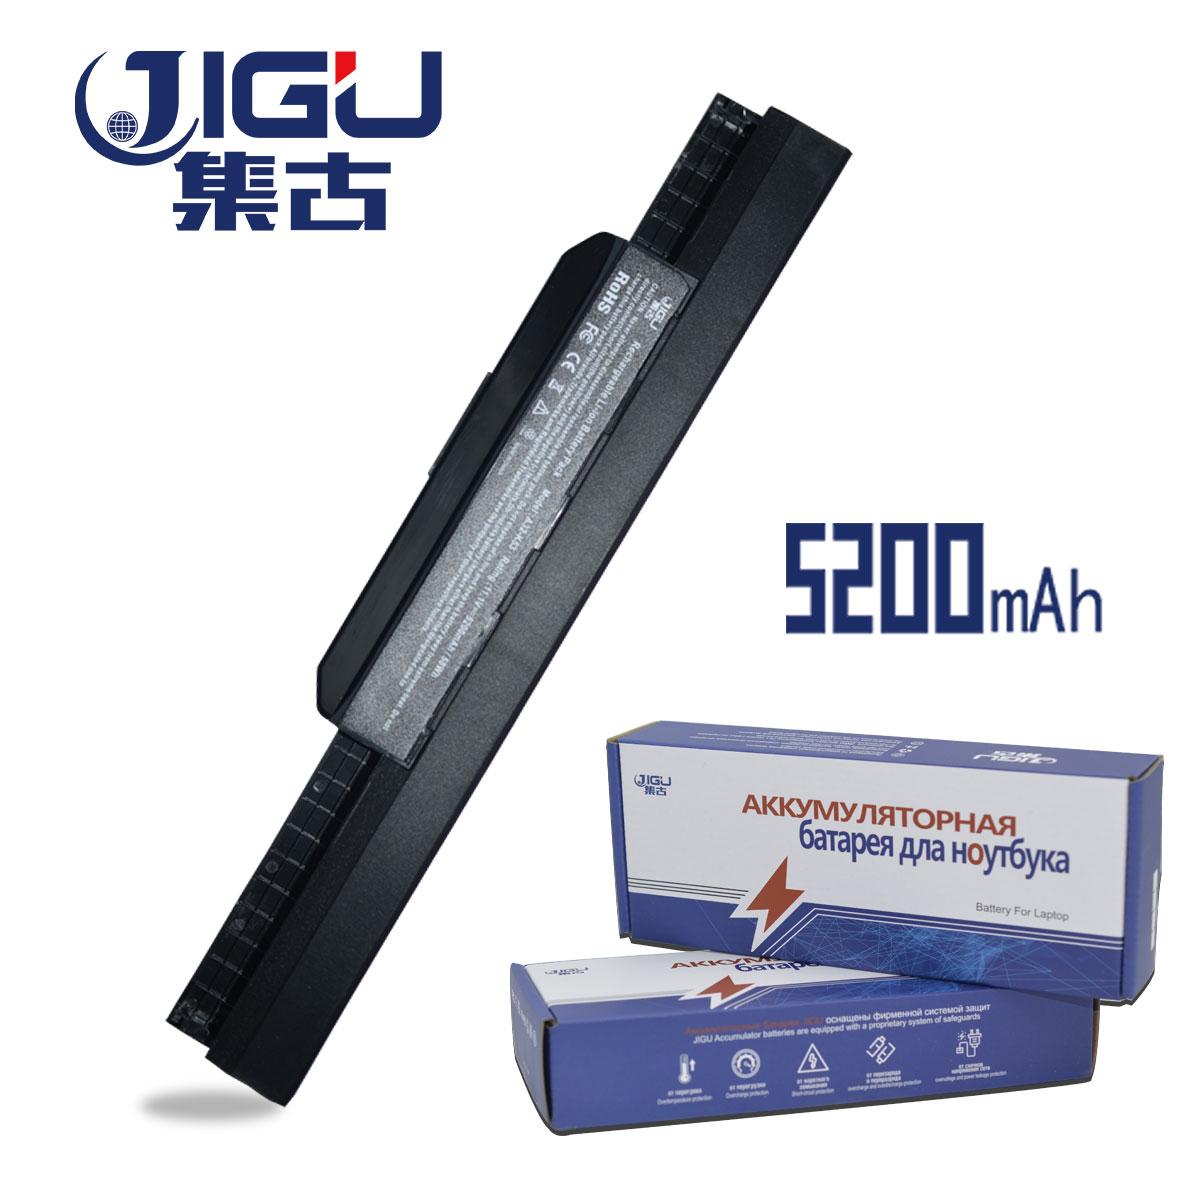 JIGU K53u Laptop Batterie Für Asus A32 K53 A42-K53 A31-K53 A41-K53 A43 A53 K43 K53 K53S X43 X44 X53 X54 x84 X53SV X53U X53B X54H